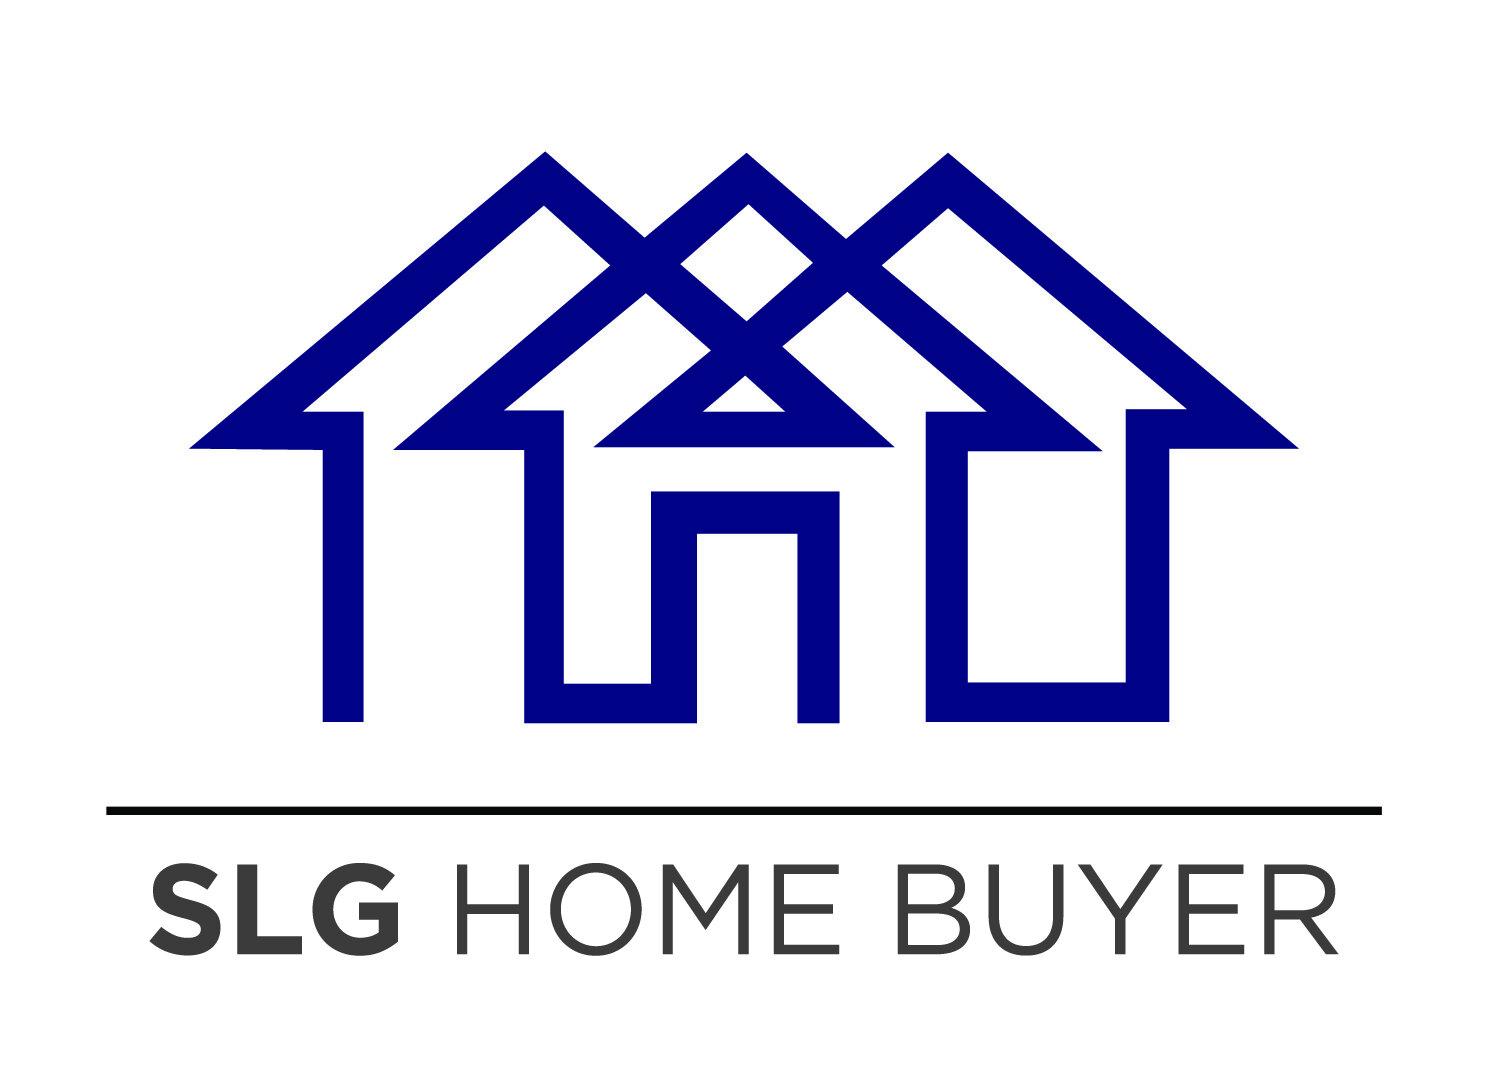 SLG Home Buyer logo